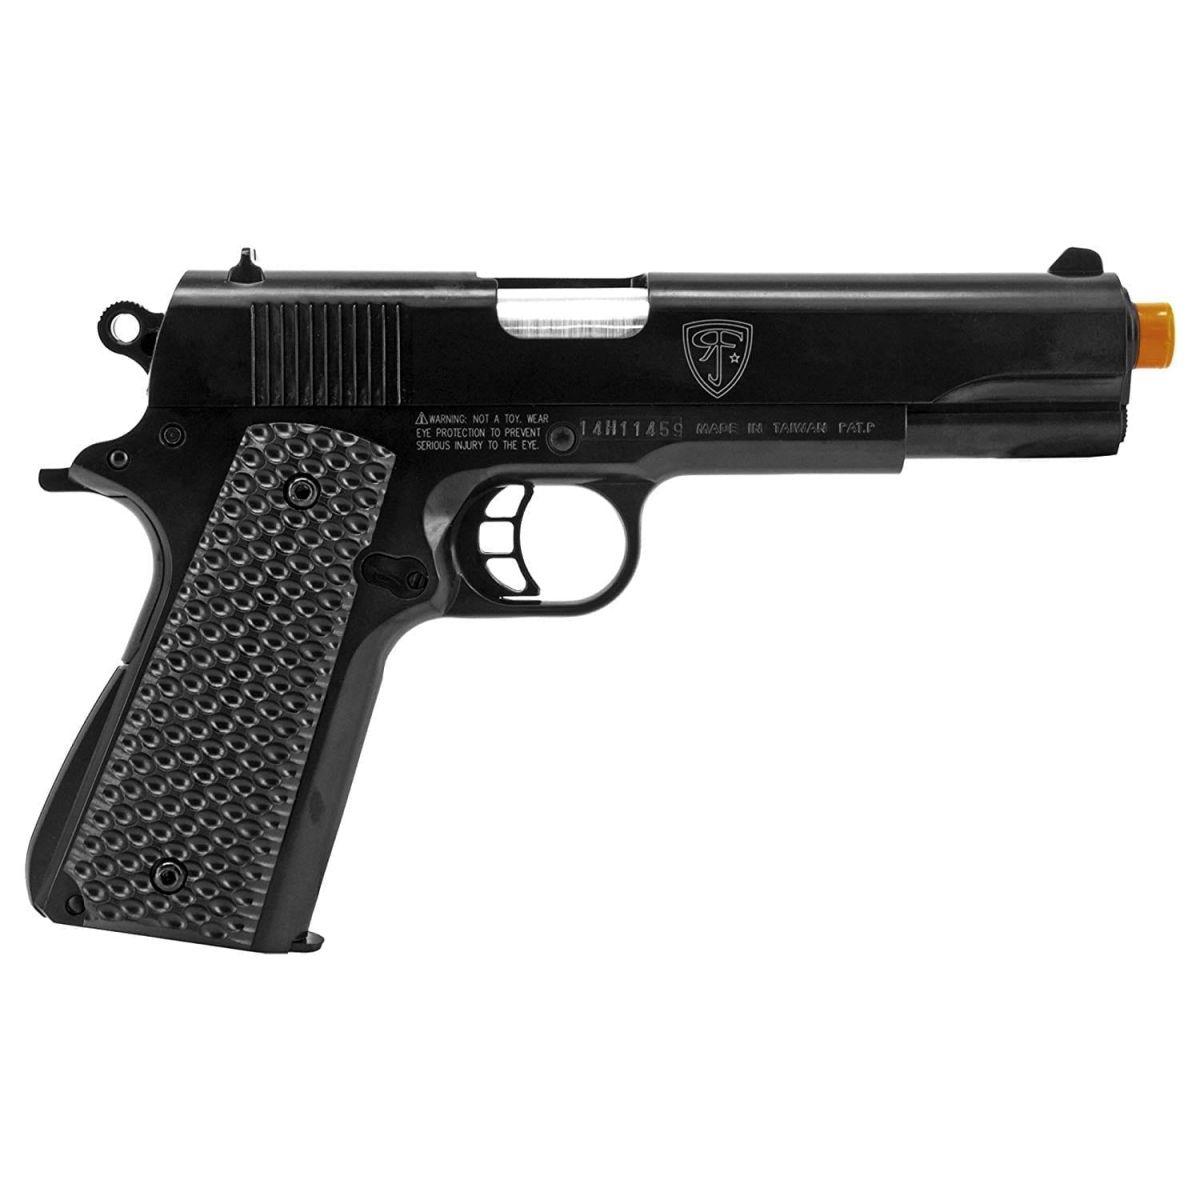 Umarex Red Jacket M1911 6mm Airsoft Spring Pistol beginner pack